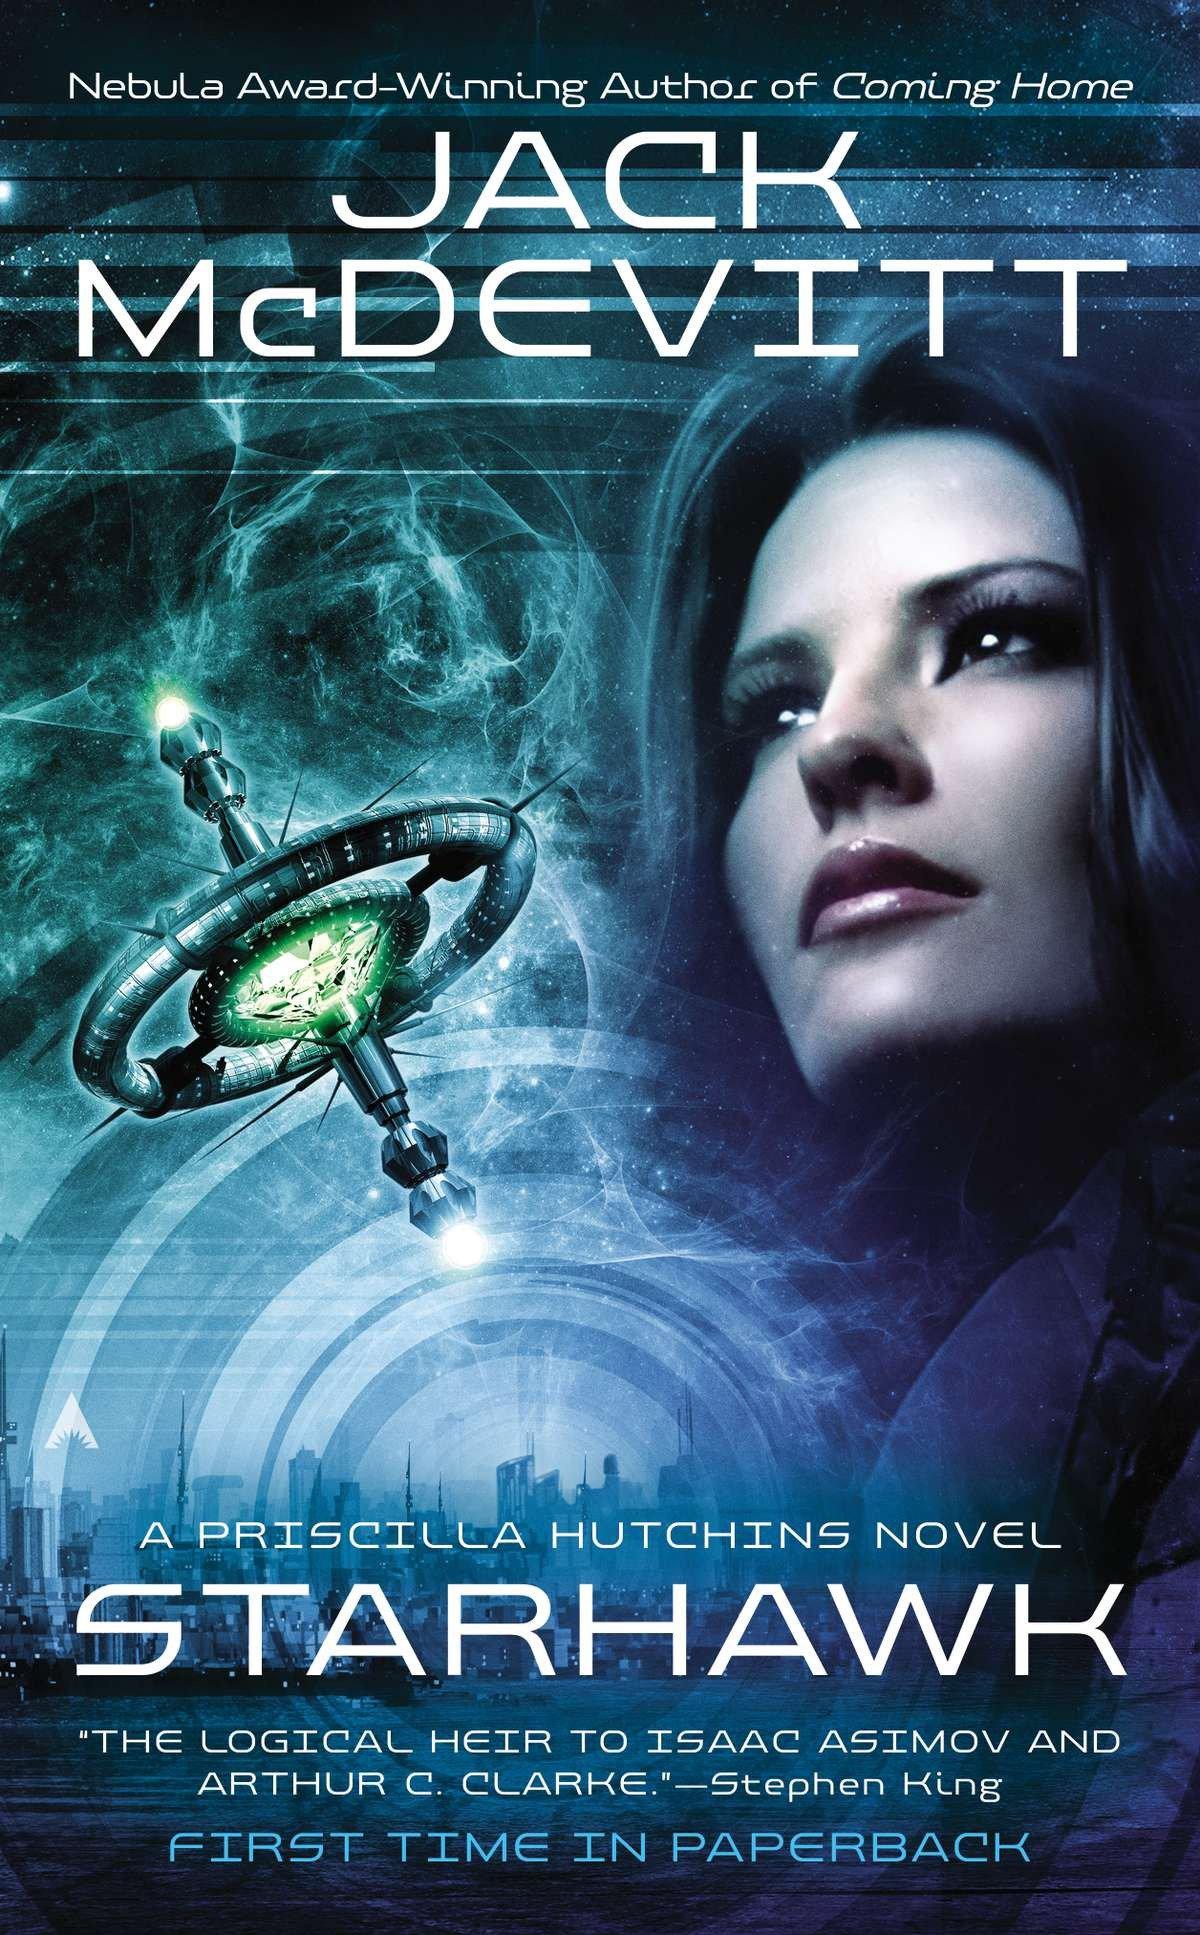 Starhawk cover image